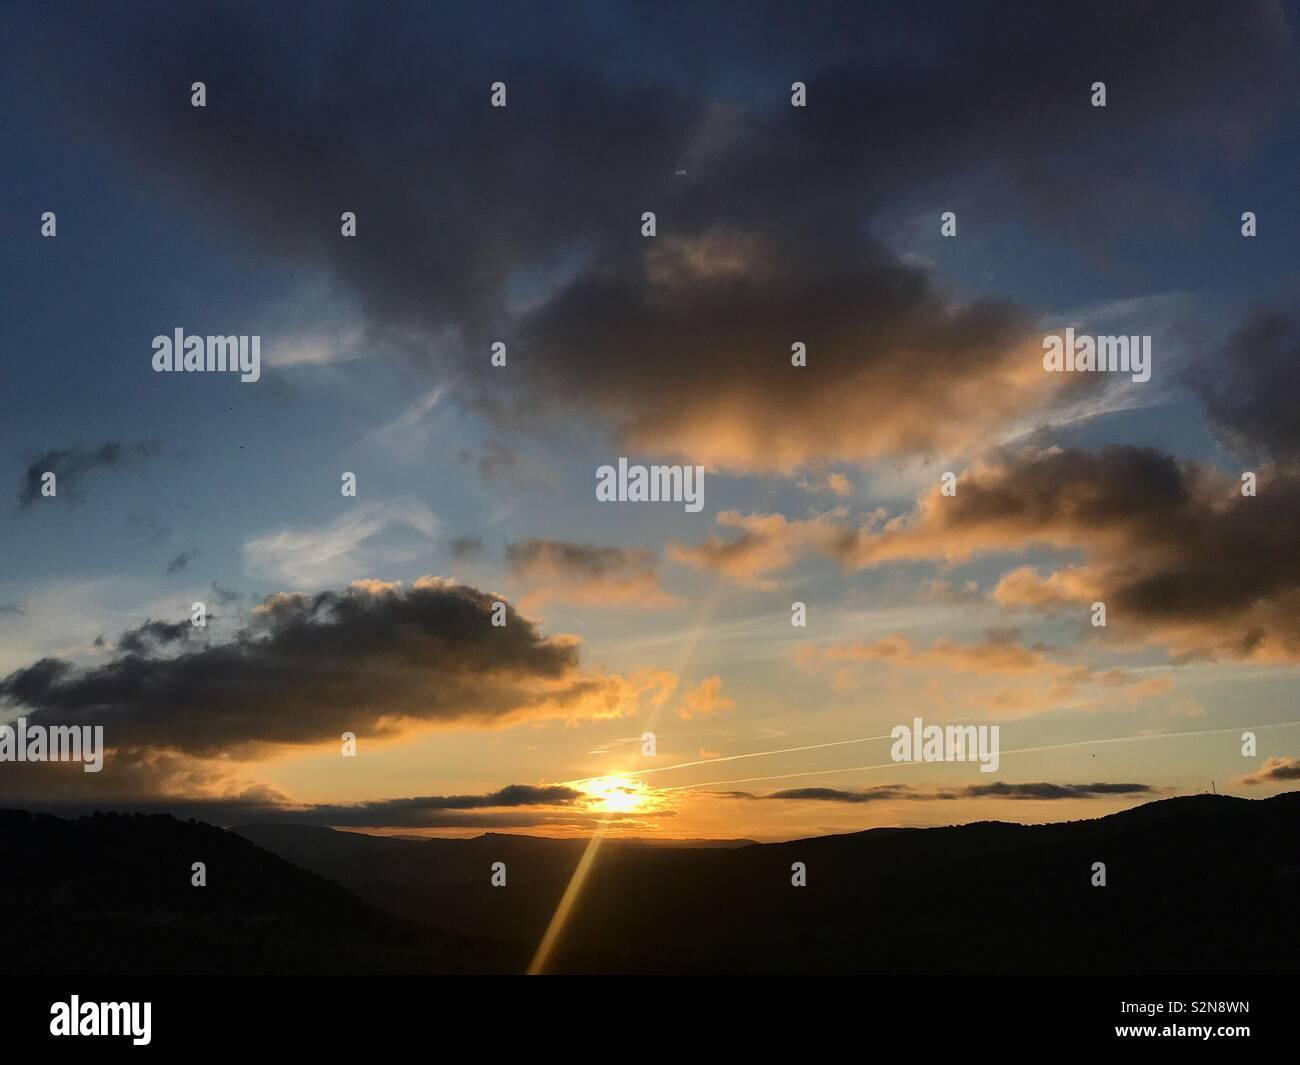 Sunrise in Grazalema, Sierra de Grazalema, Cadice provincia, Andalusia, Spagna Foto Stock